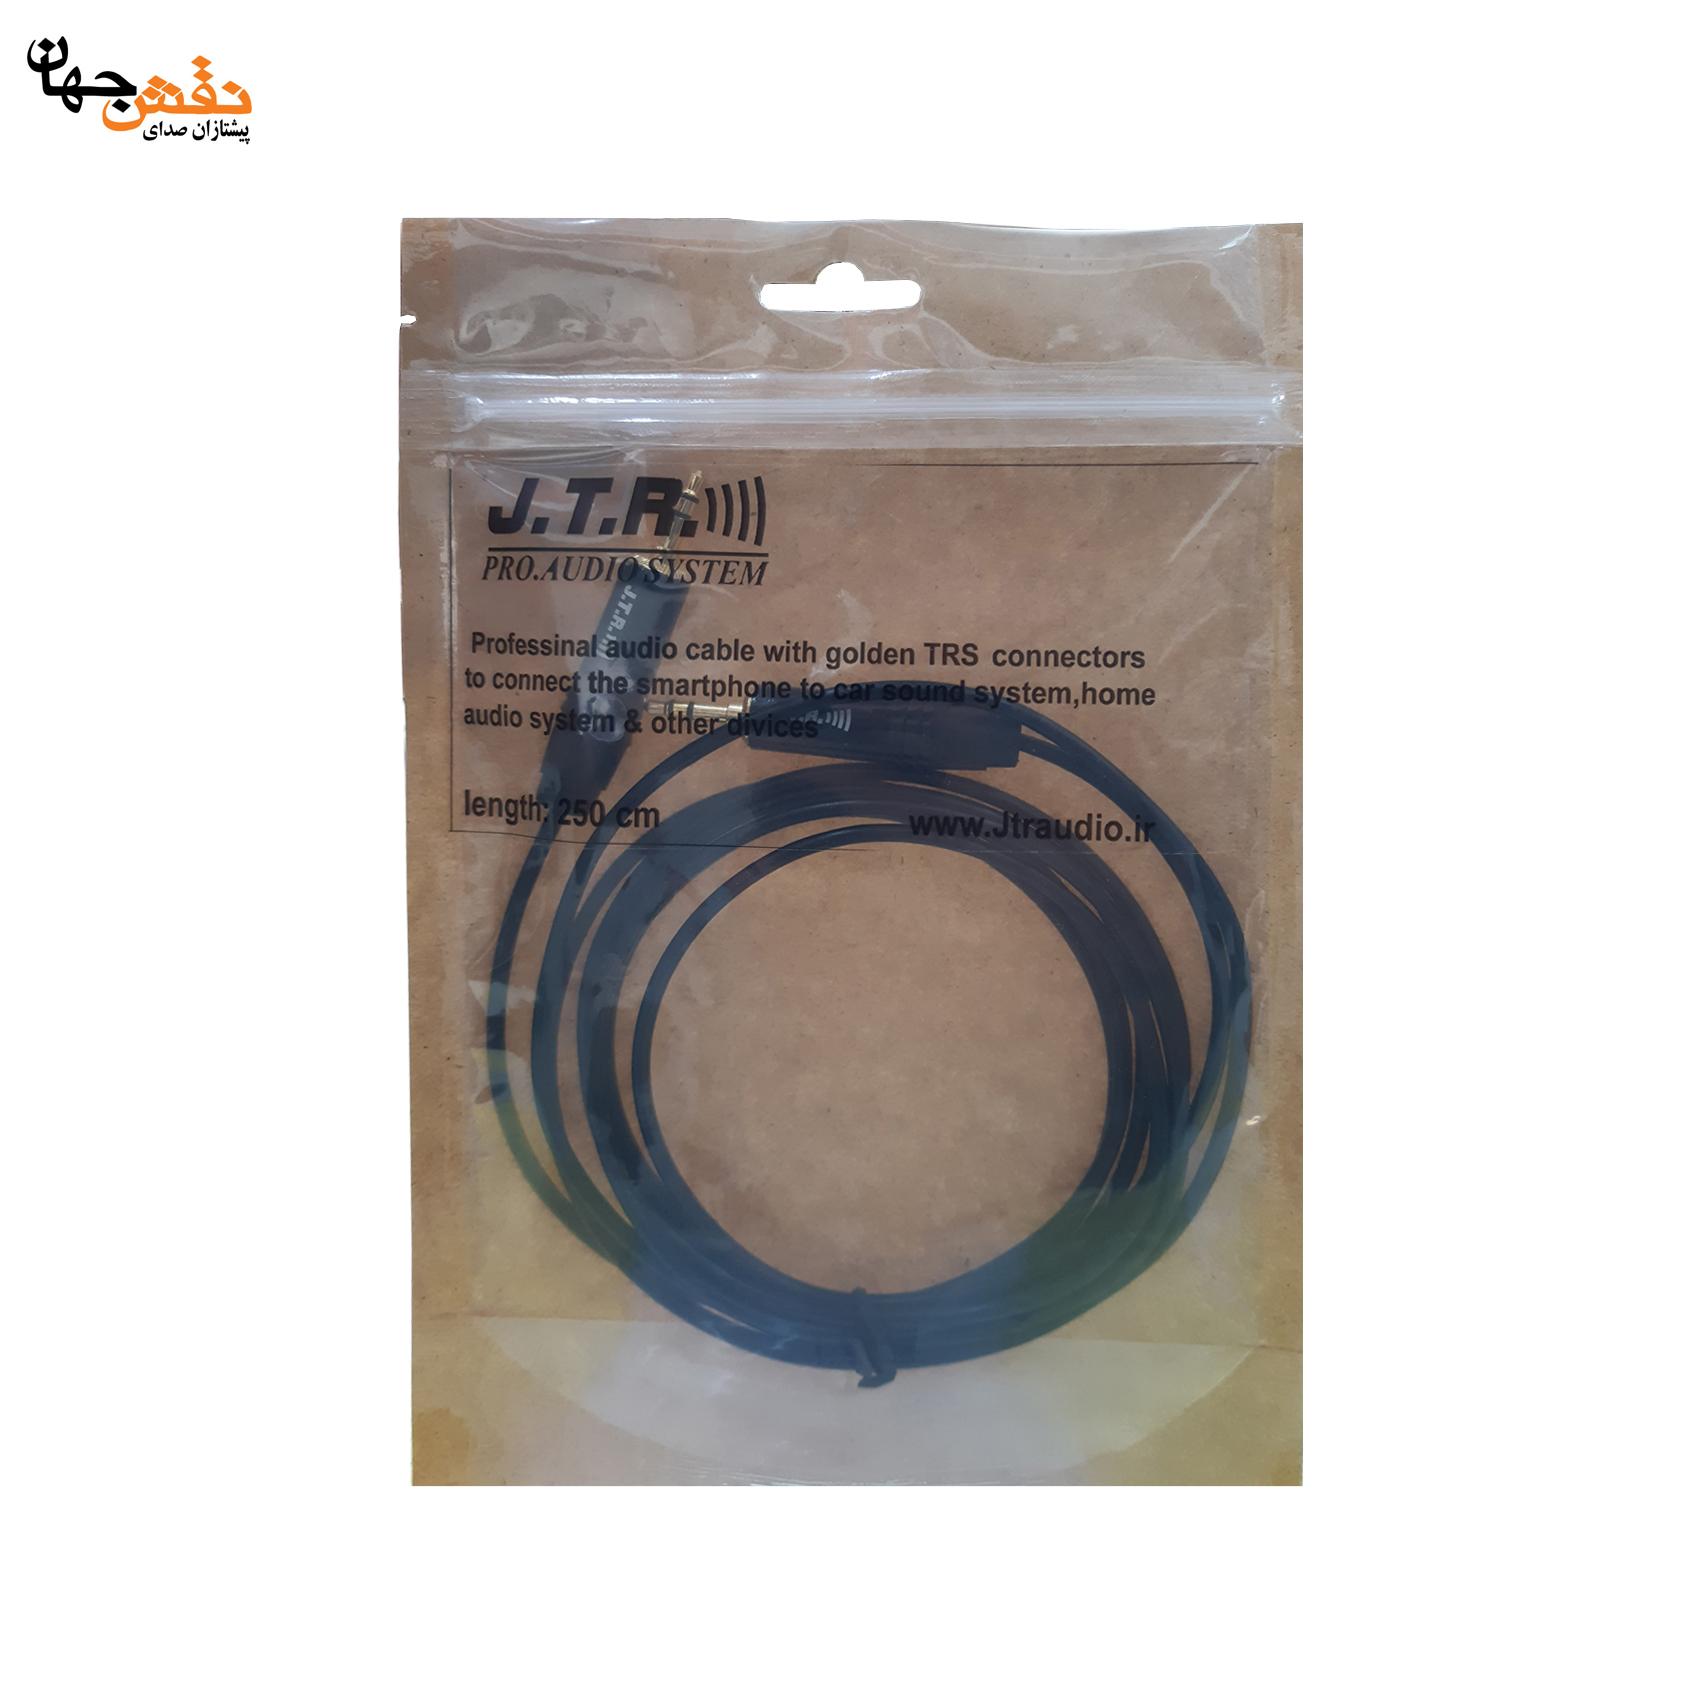 jtr cable soundco.ir-4